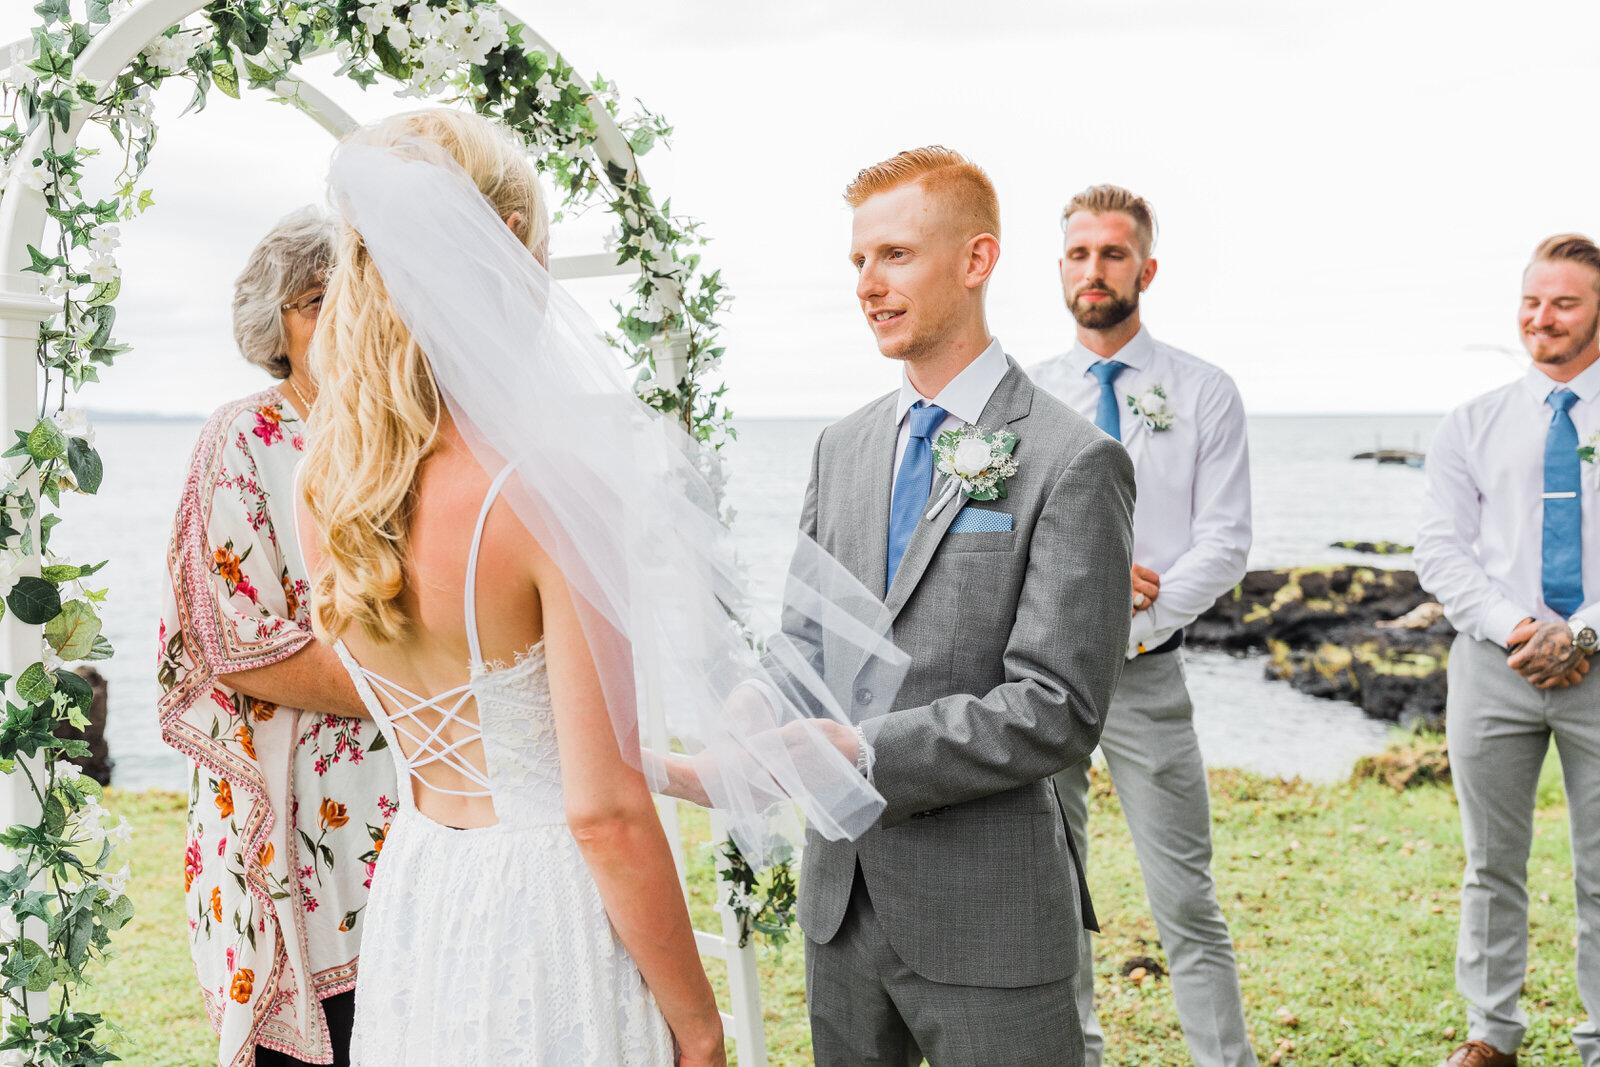 small-wedding-hawaii-destination-hilton-coconut-island-9763-1.jpg